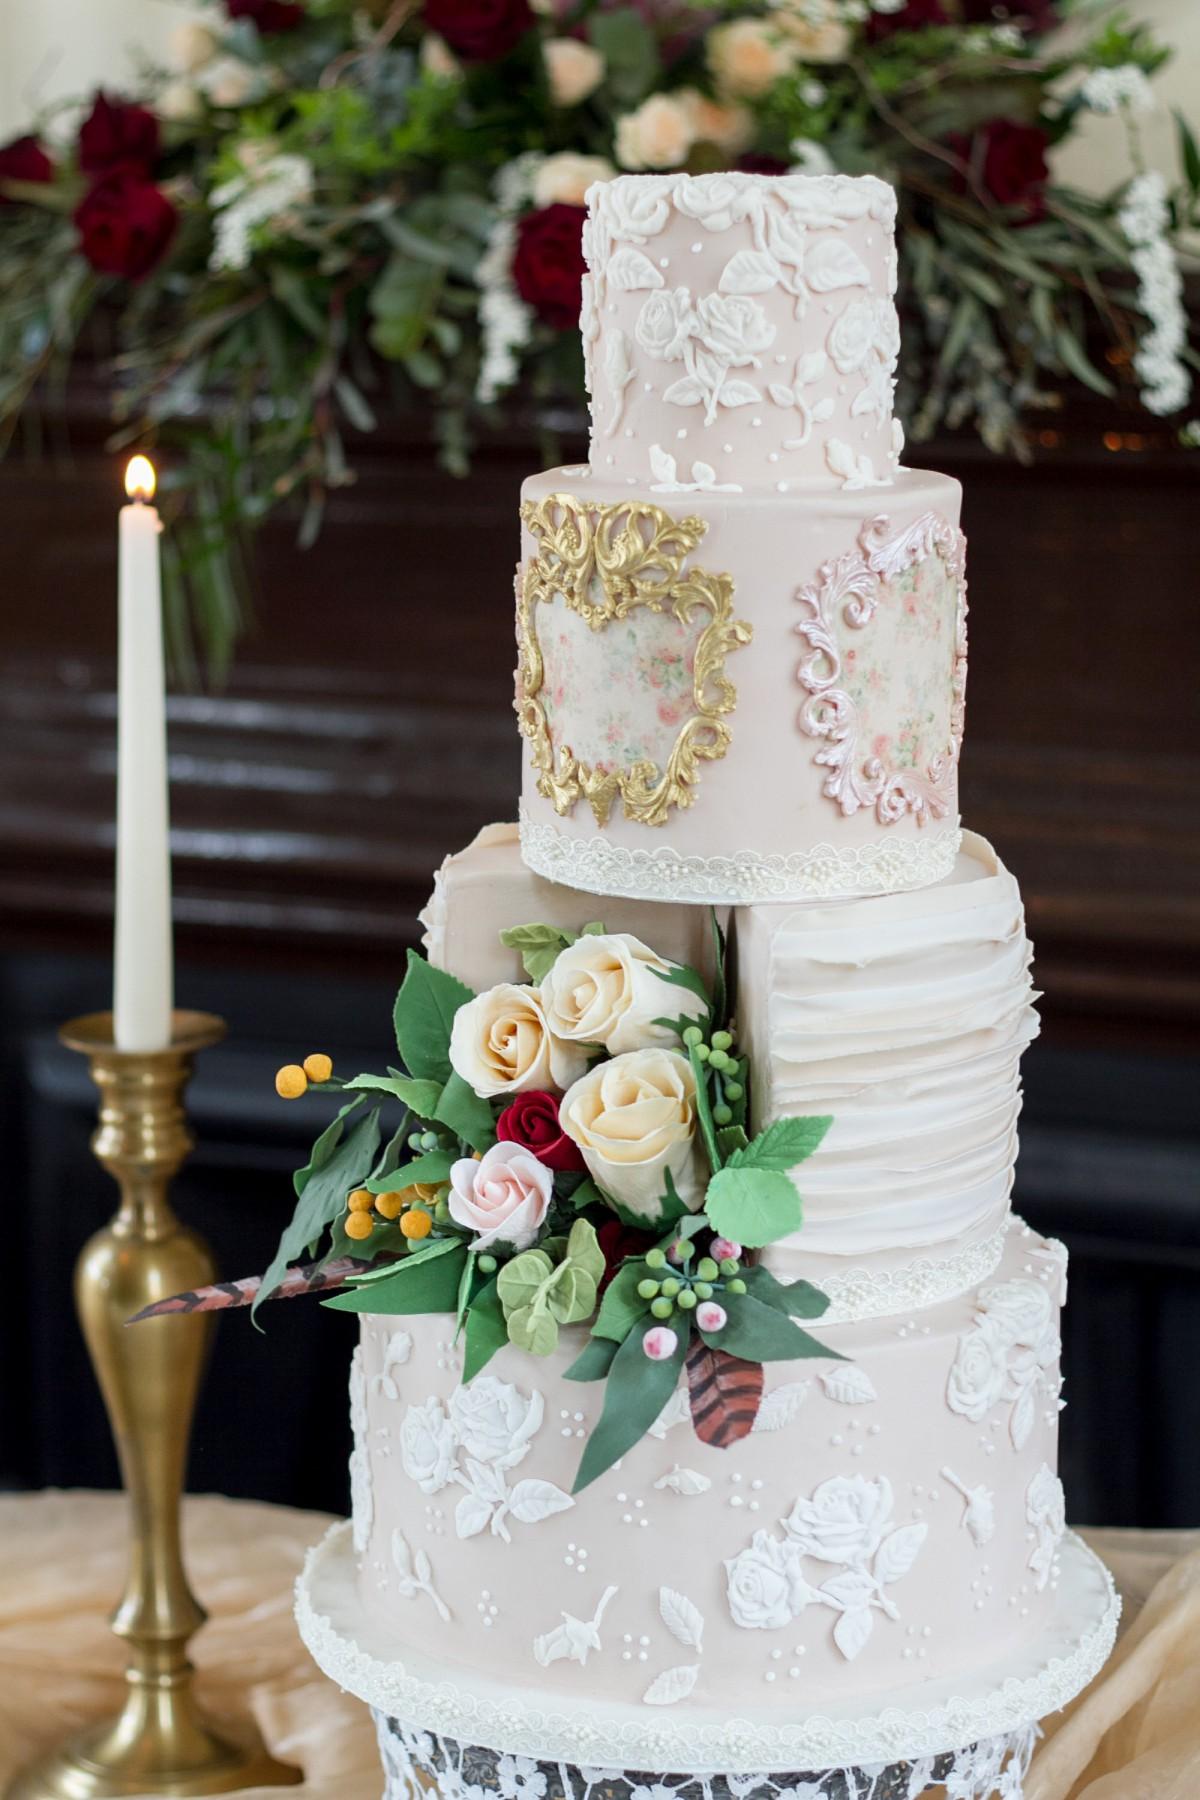 Iso Elegant Photography - Leicester wedding network - Railway wedding - vintage wedding 24